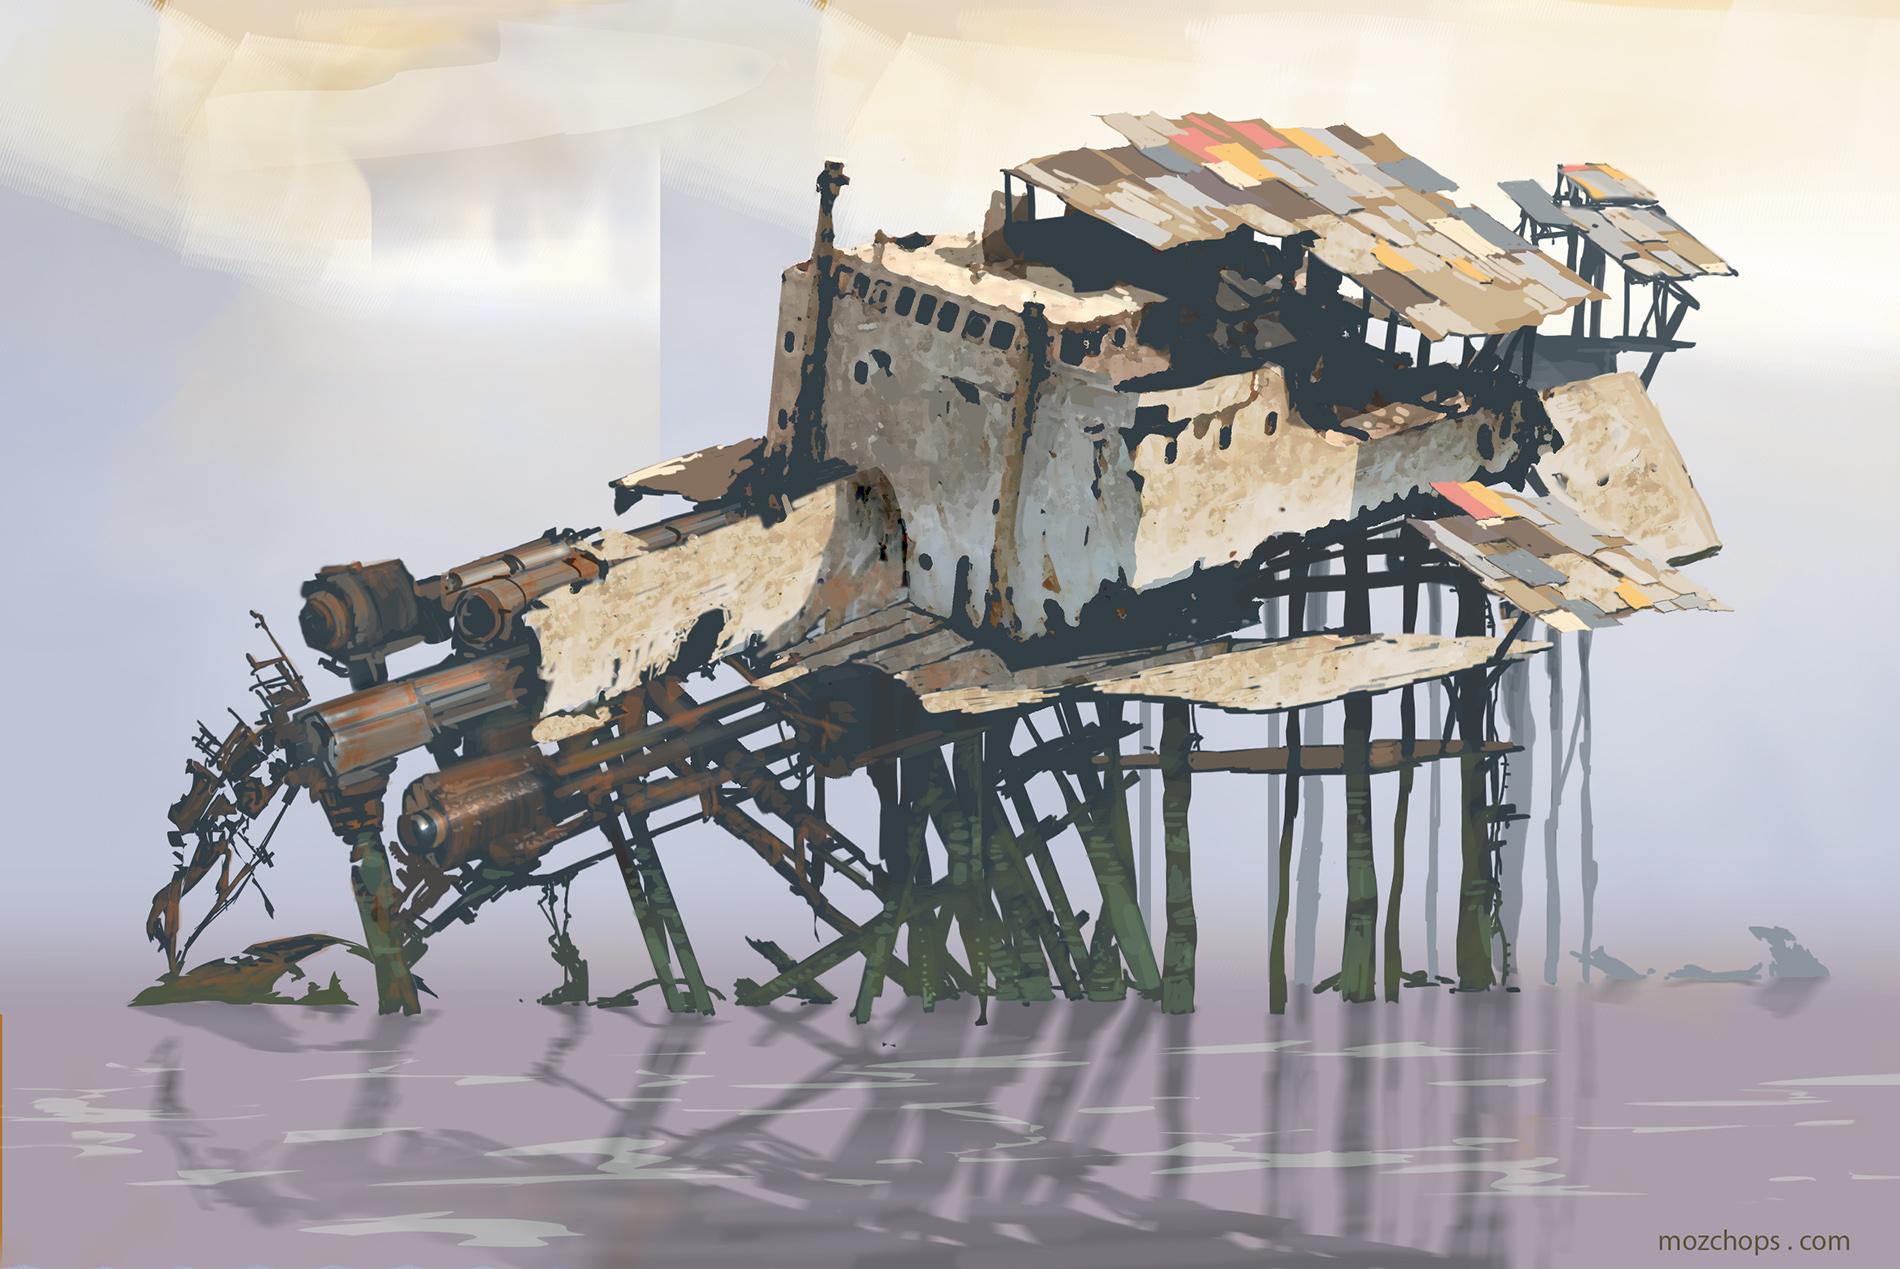 Junk shanty 01 by Mozchops